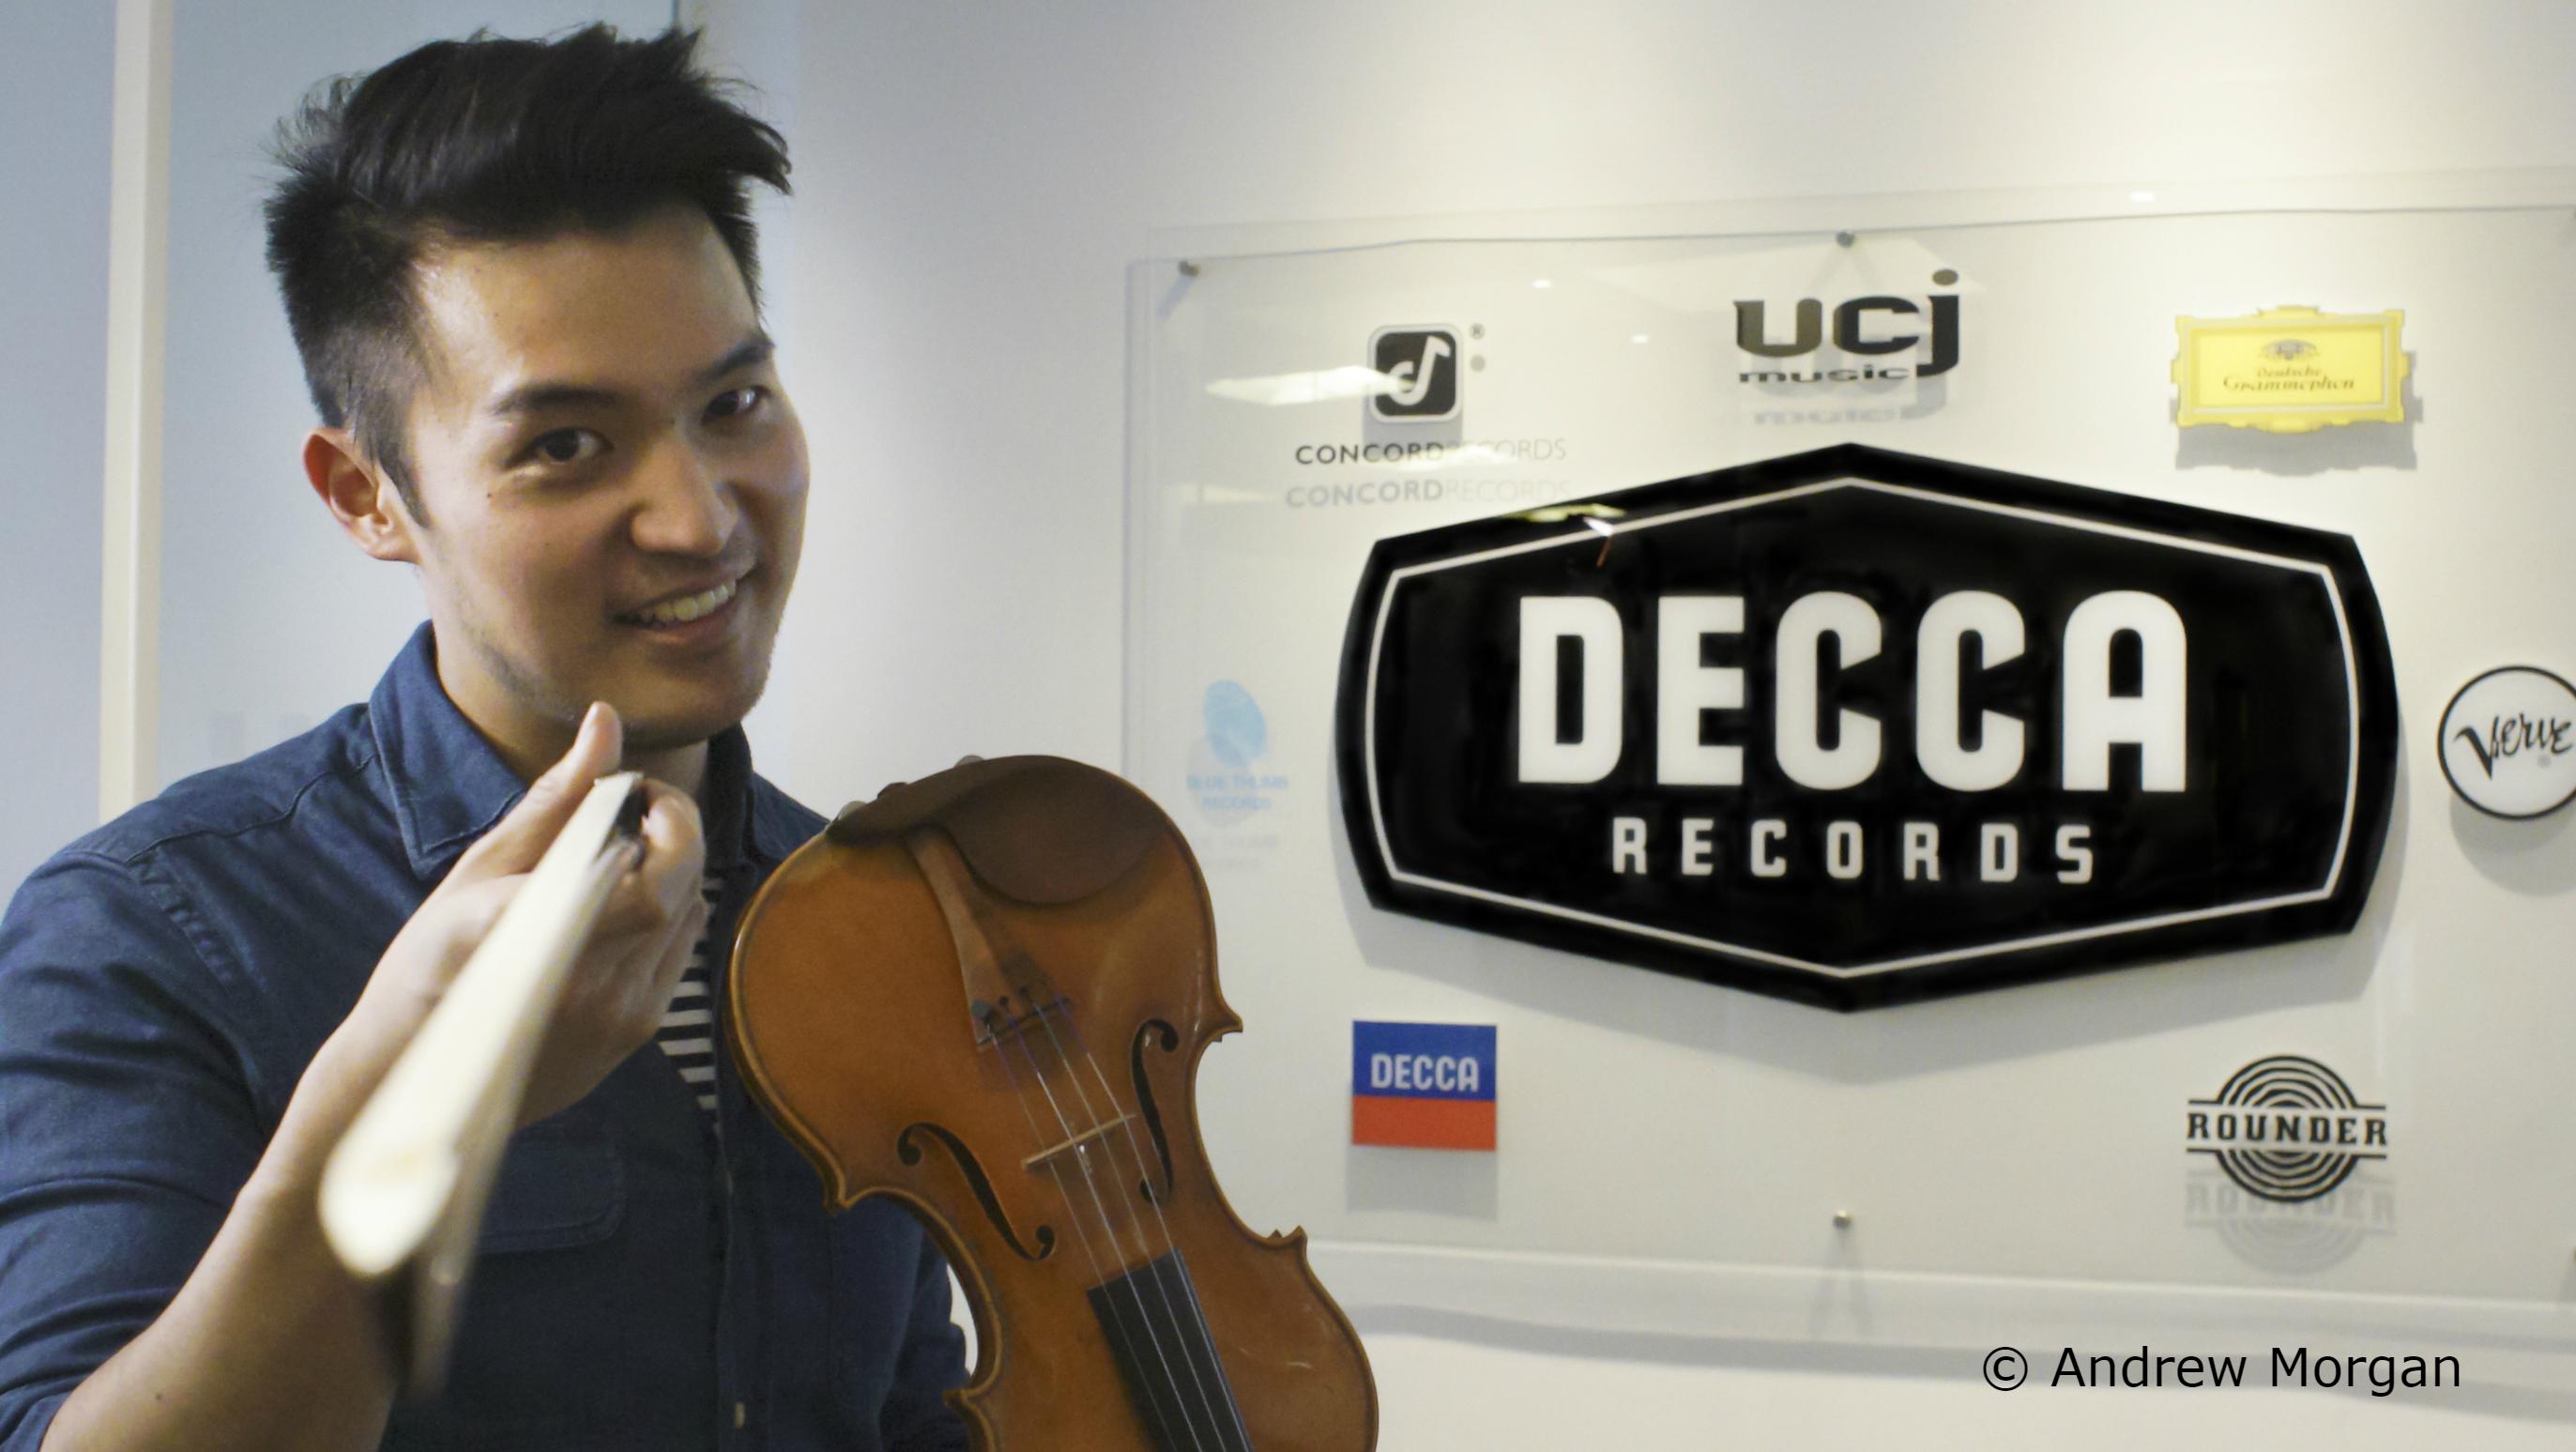 Ray Chen Decca Signing Credit Andrew Morgan